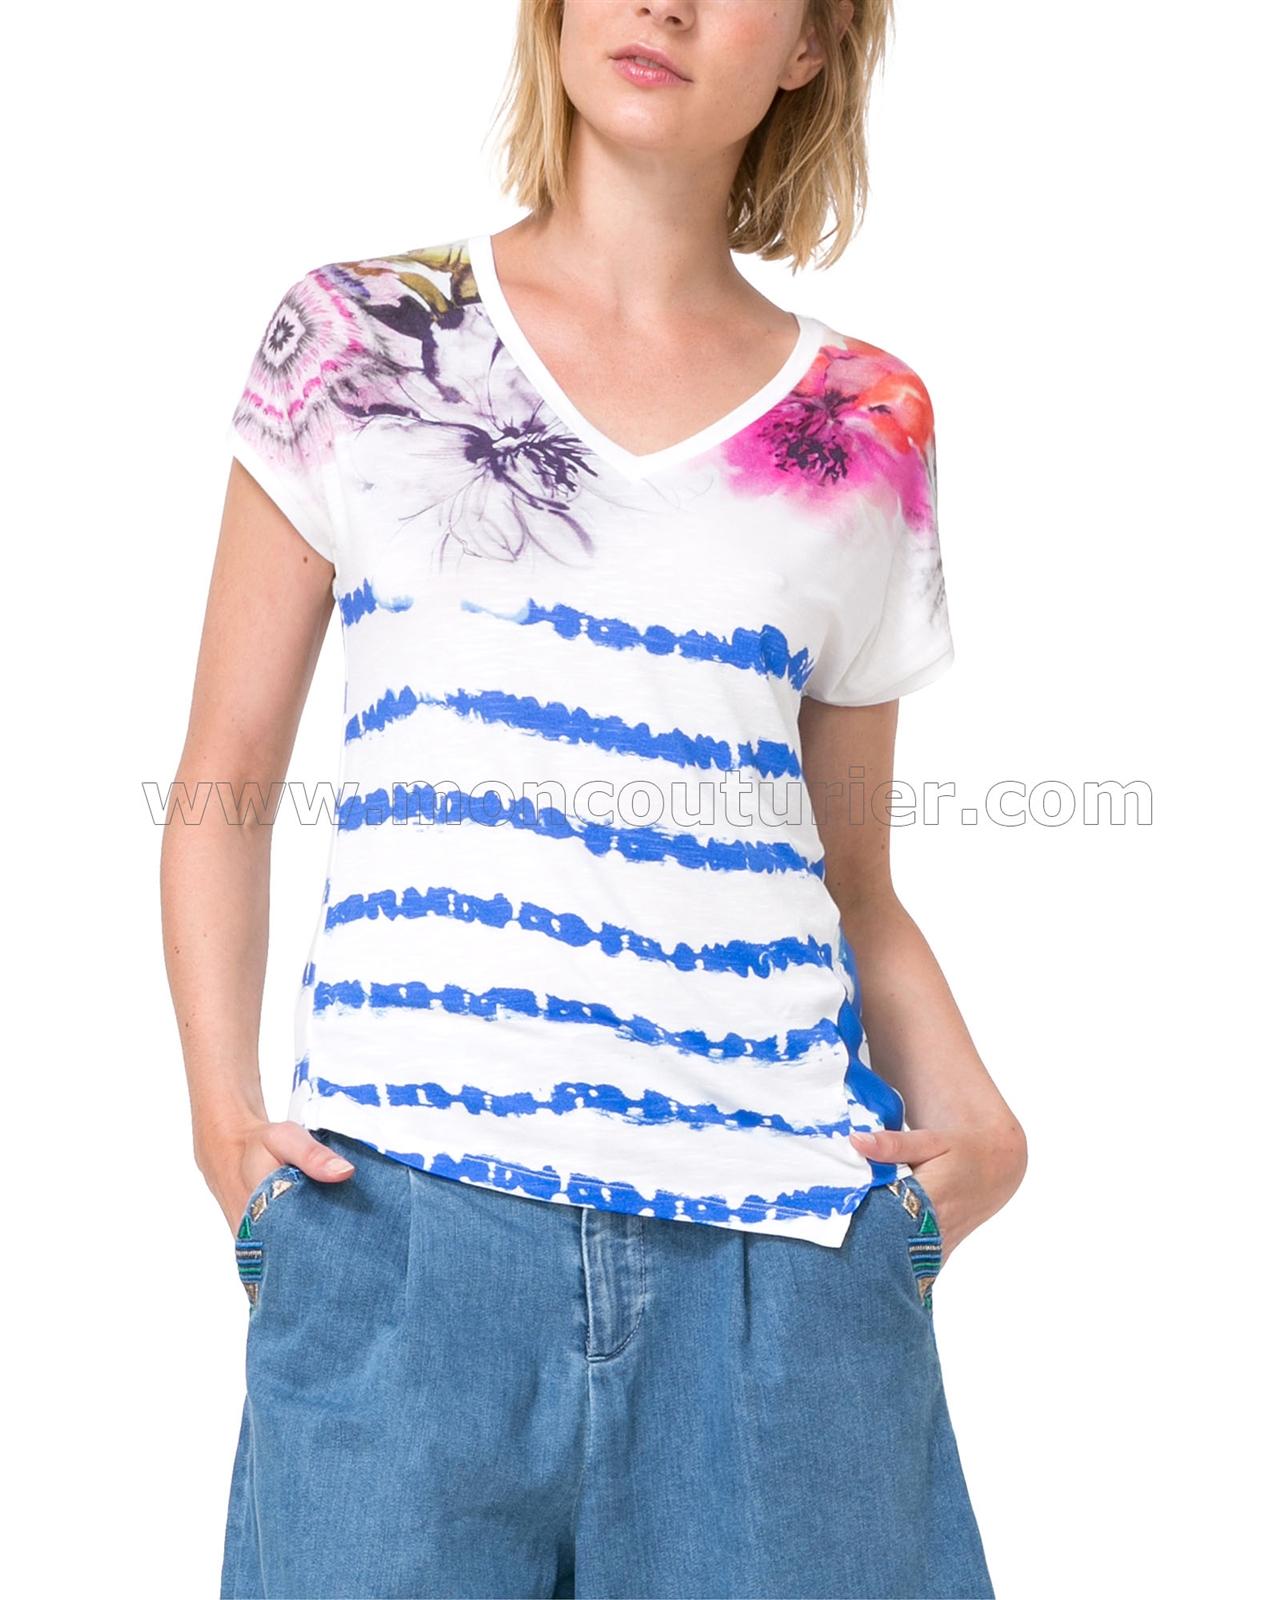 desigual women 39 s t shirt cellia. Black Bedroom Furniture Sets. Home Design Ideas